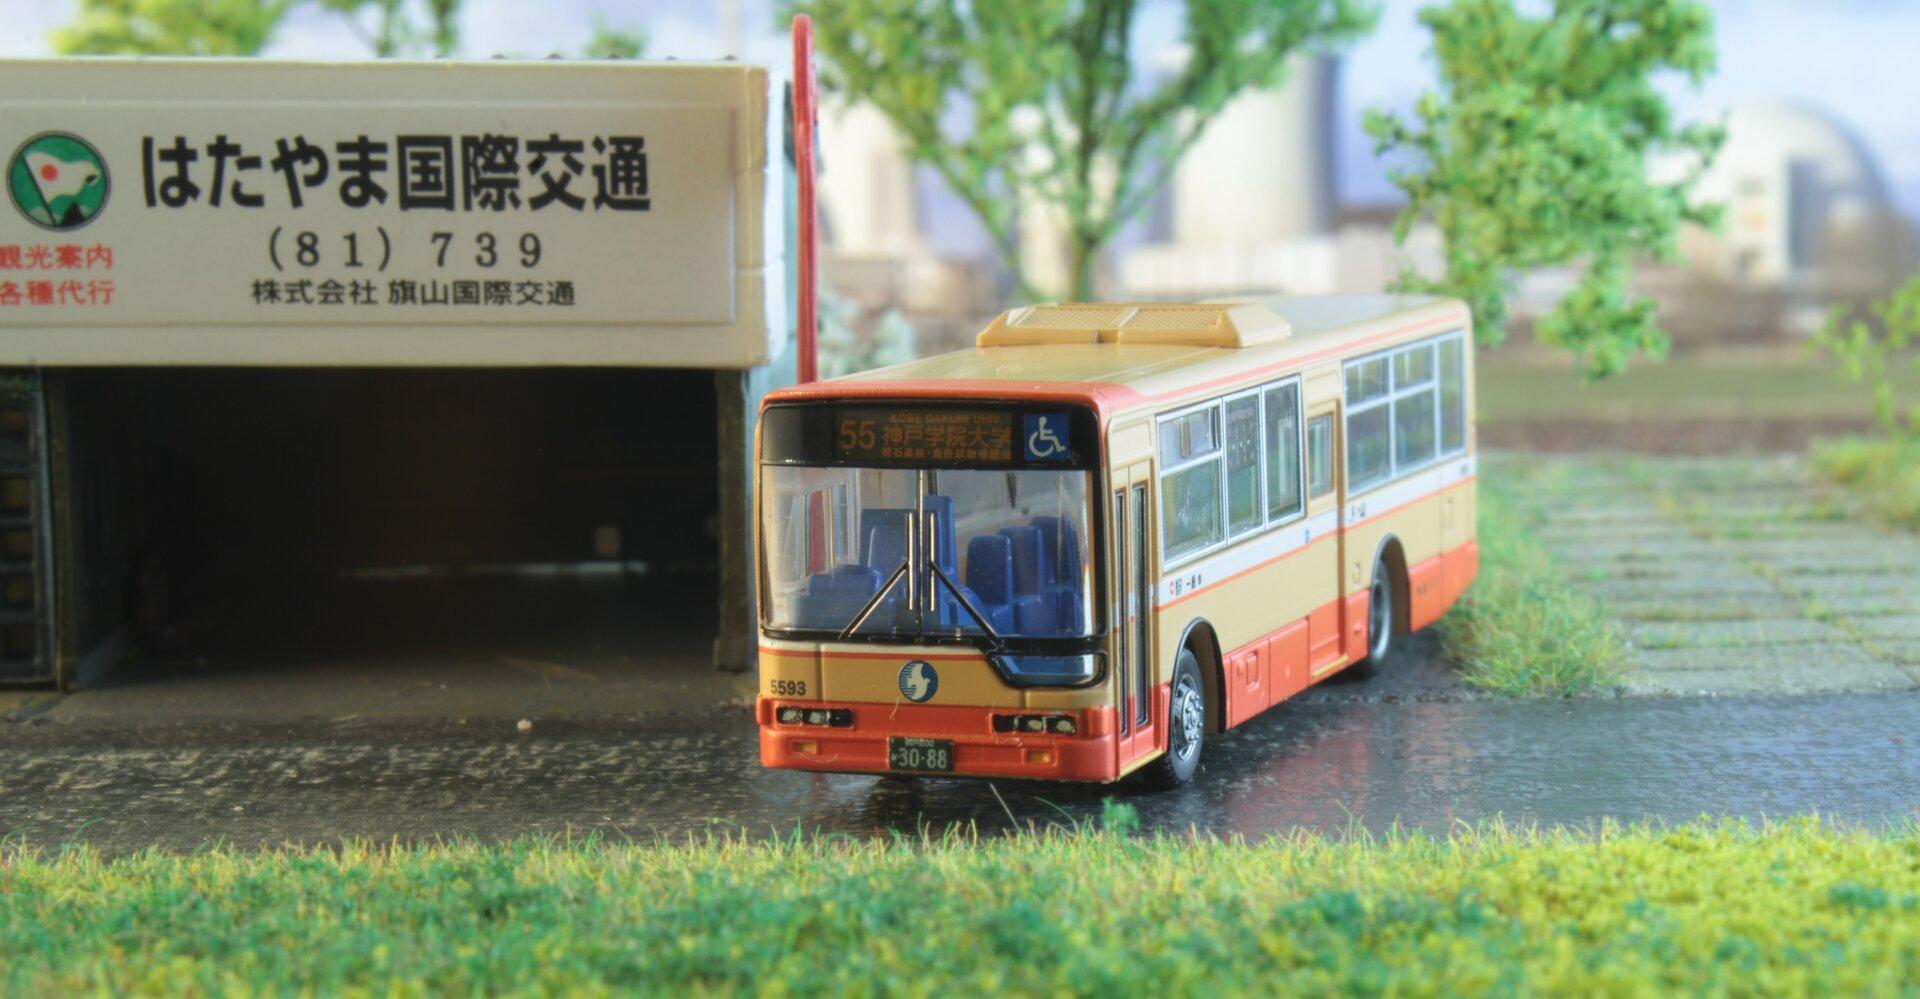 IMG_5108.JPG